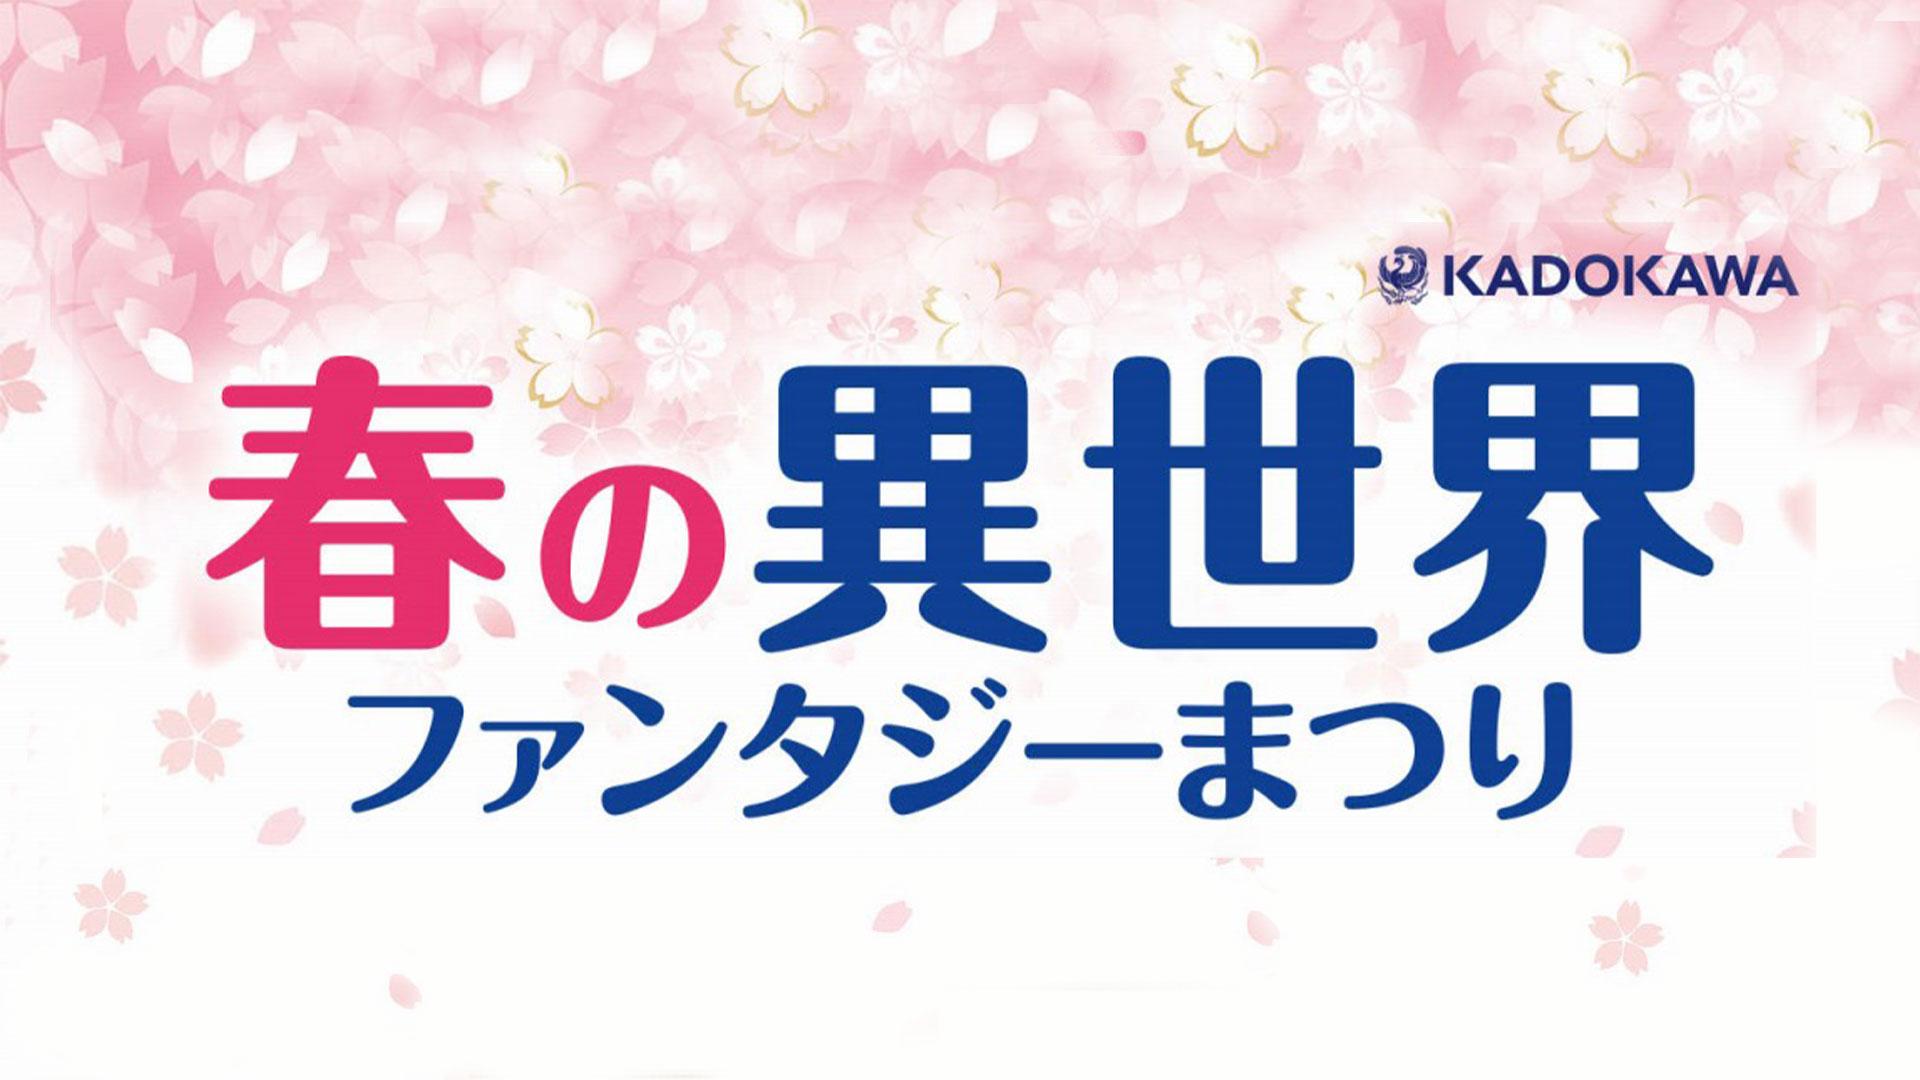 KADOKAWA 春の異世界×ファン タジーまつり